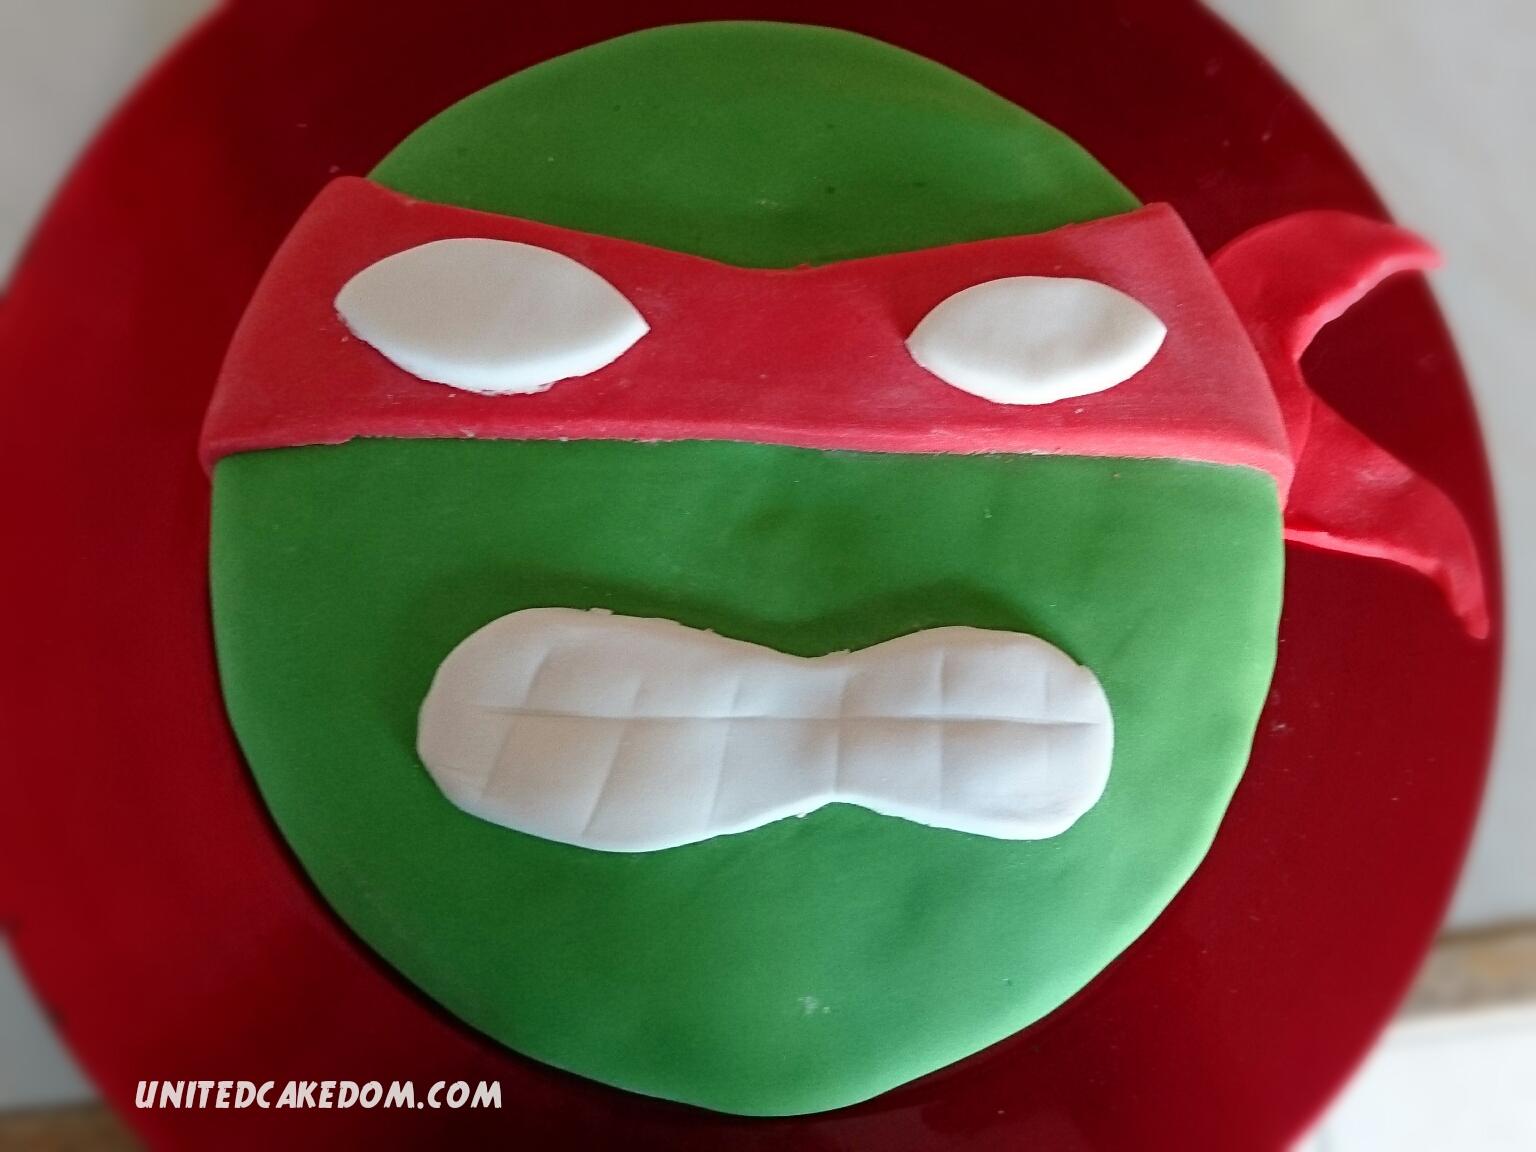 Amazing United Cakedom Teenage Mutant Ninja Turtle Cake Birthday Funny Birthday Cards Online Bapapcheapnameinfo